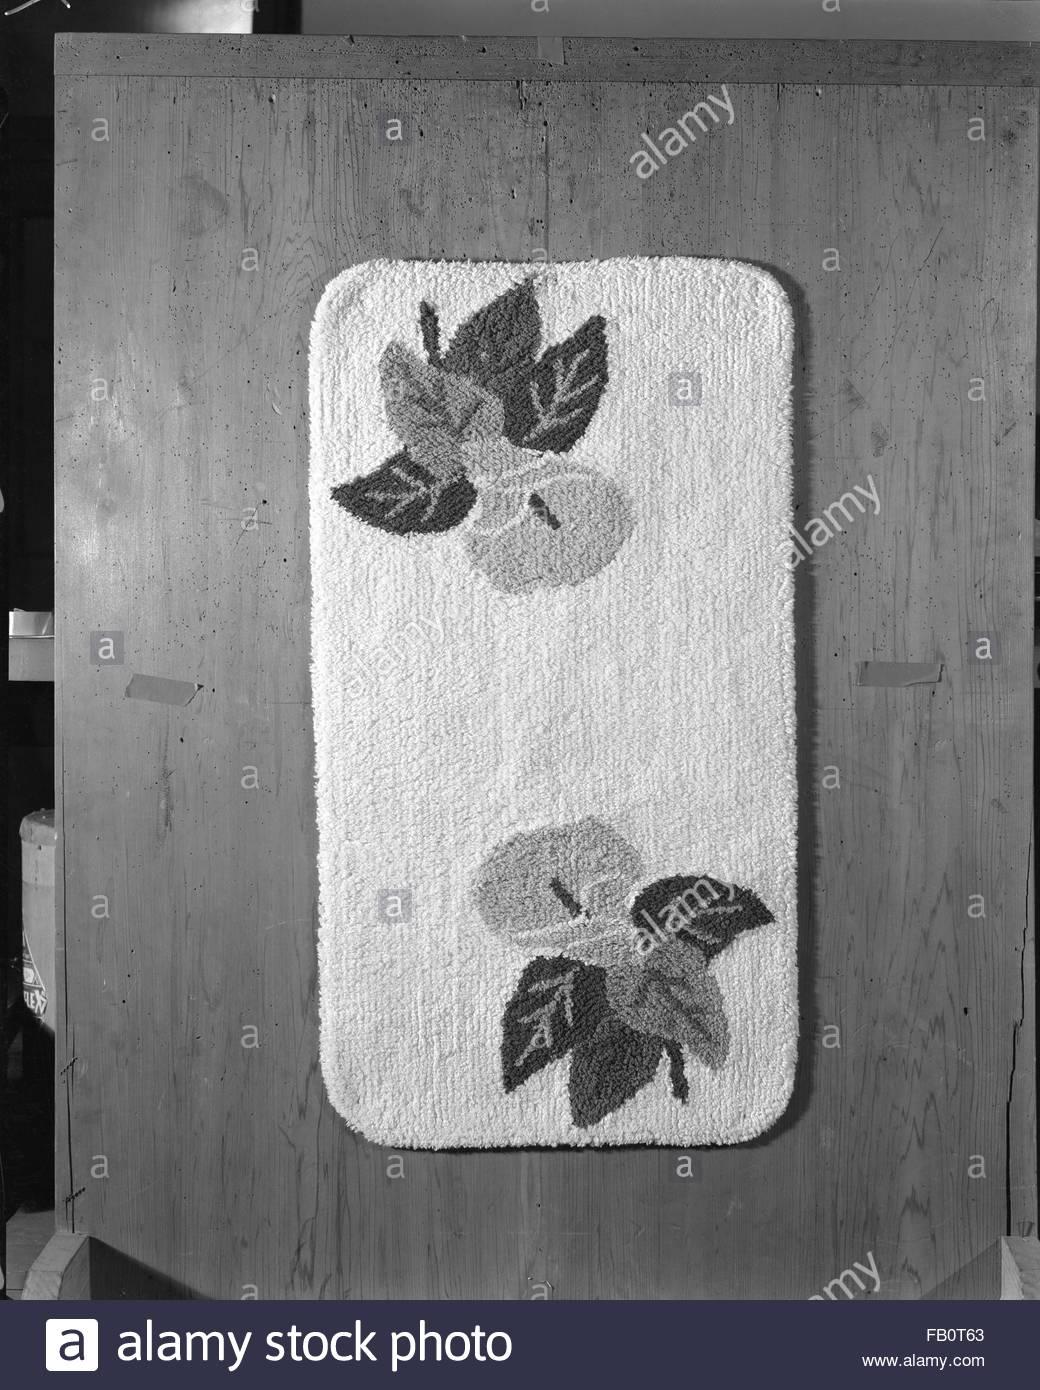 Carpets at Marshall Field and Company, 1941 Jan. 4. - Stock Image